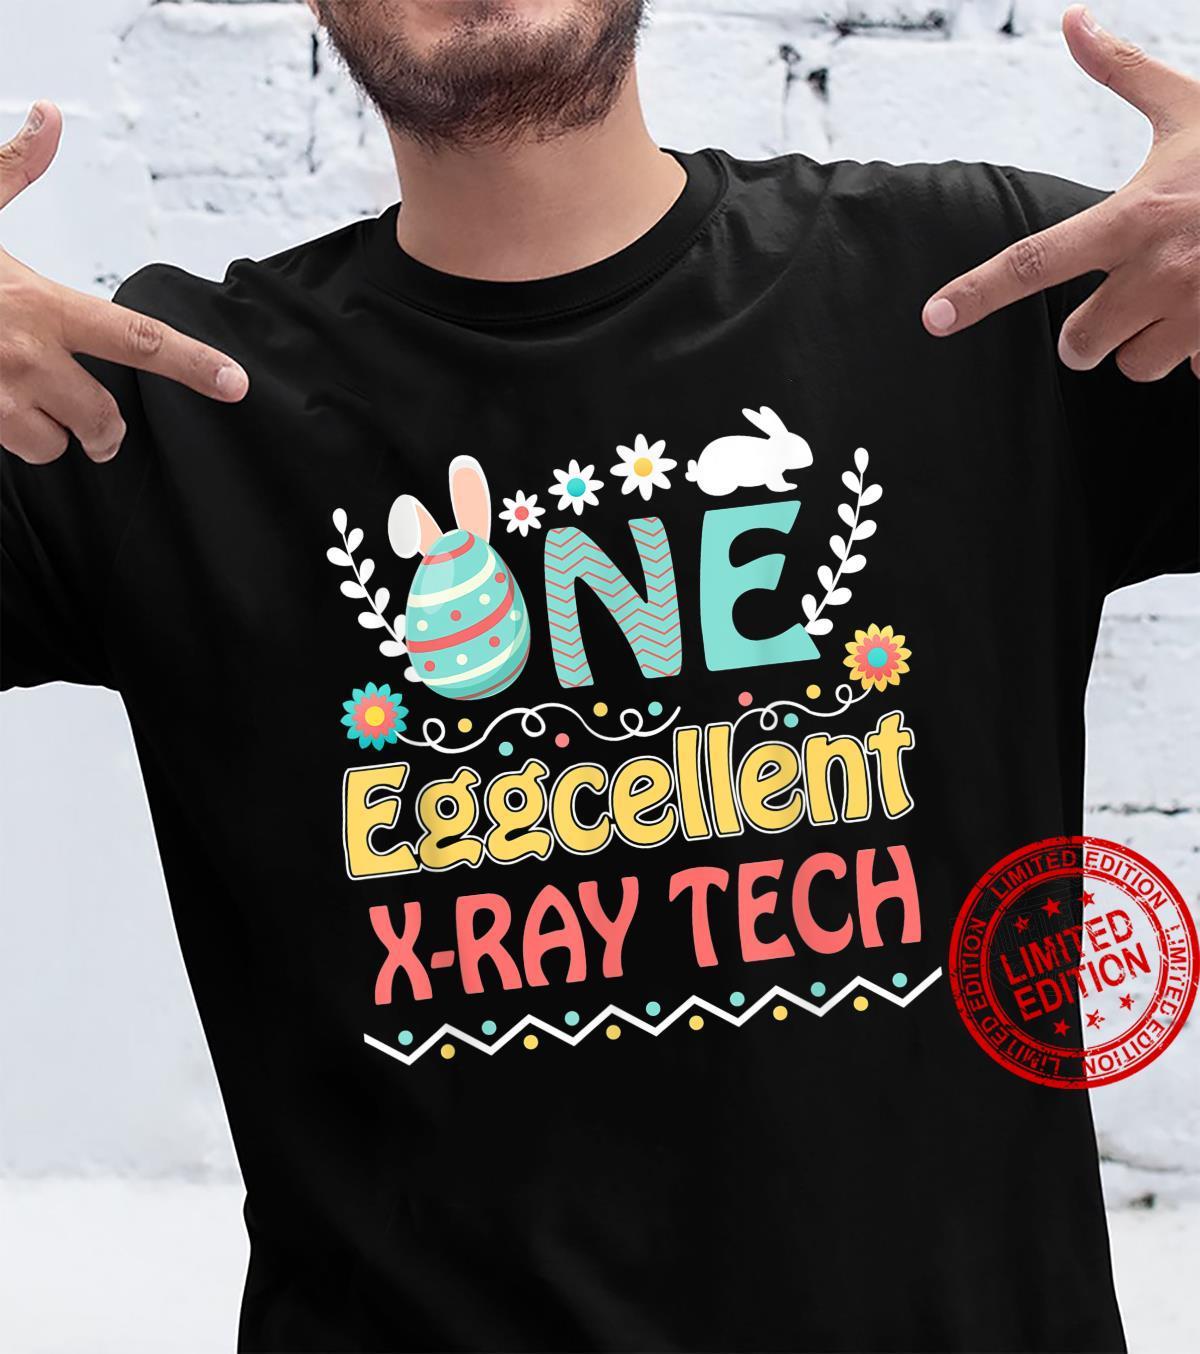 Funny Easter Day XRay Tech Design Technician Shirt